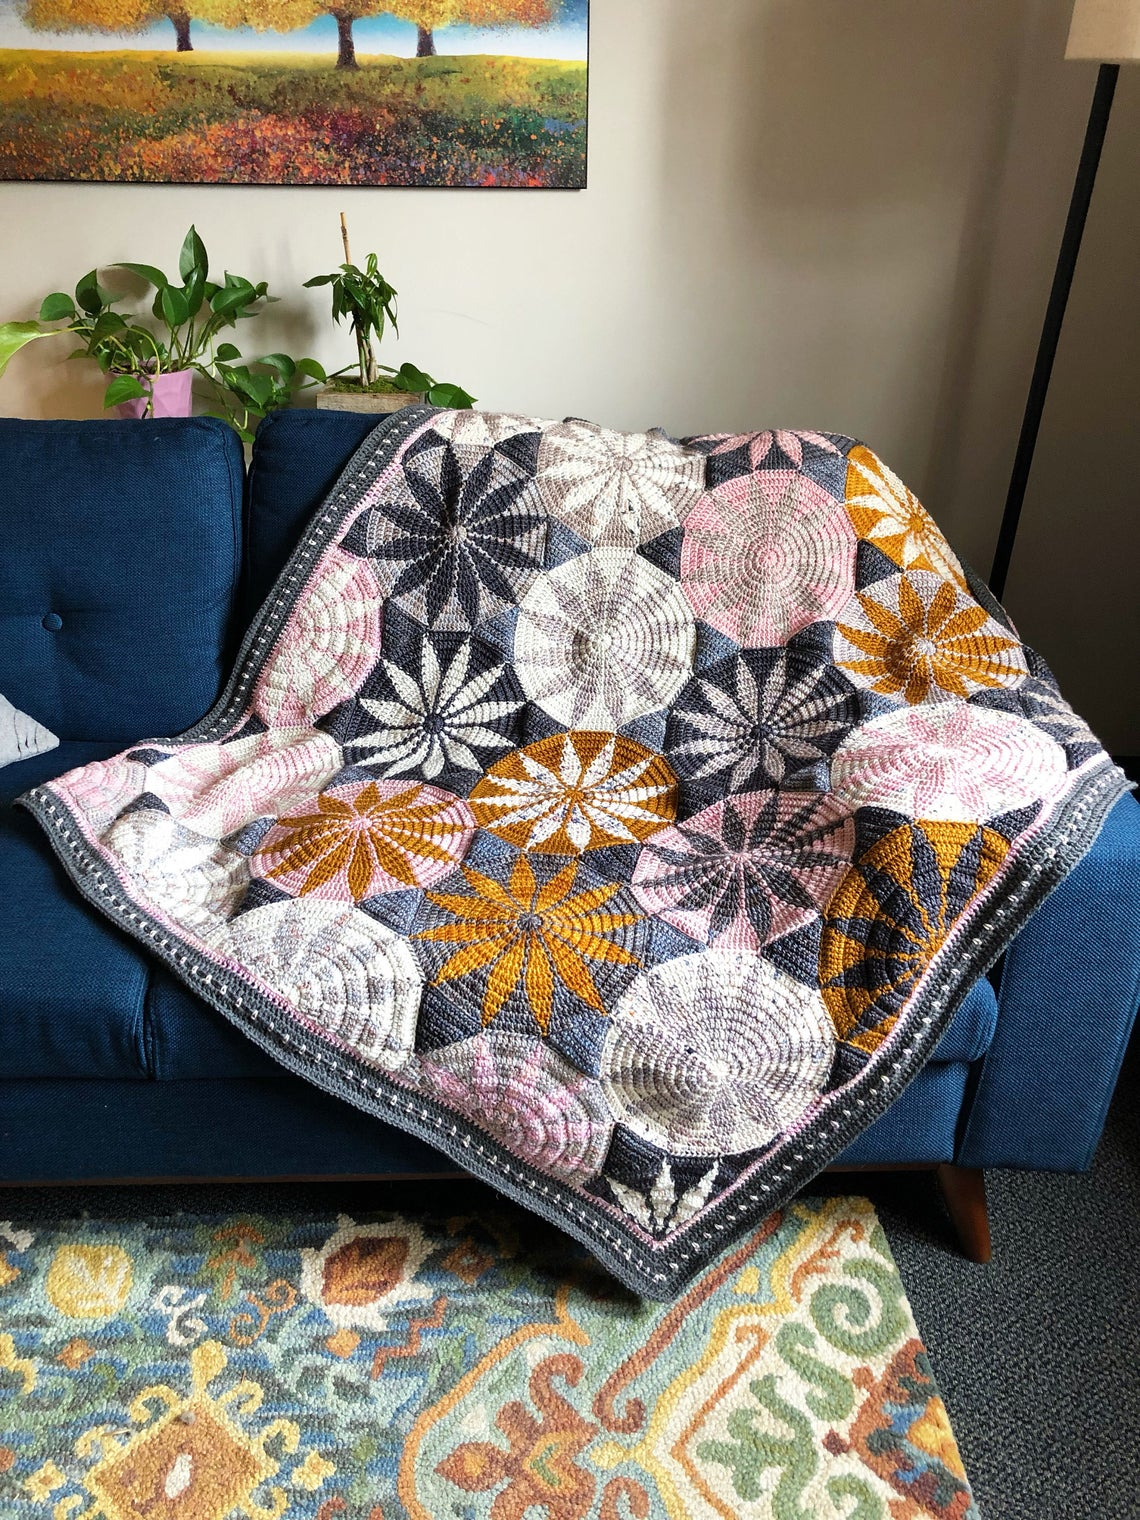 Crochet a Sophisticated Marguerite Blanket, Designed By Sandra Eng of Mobius Girl Design